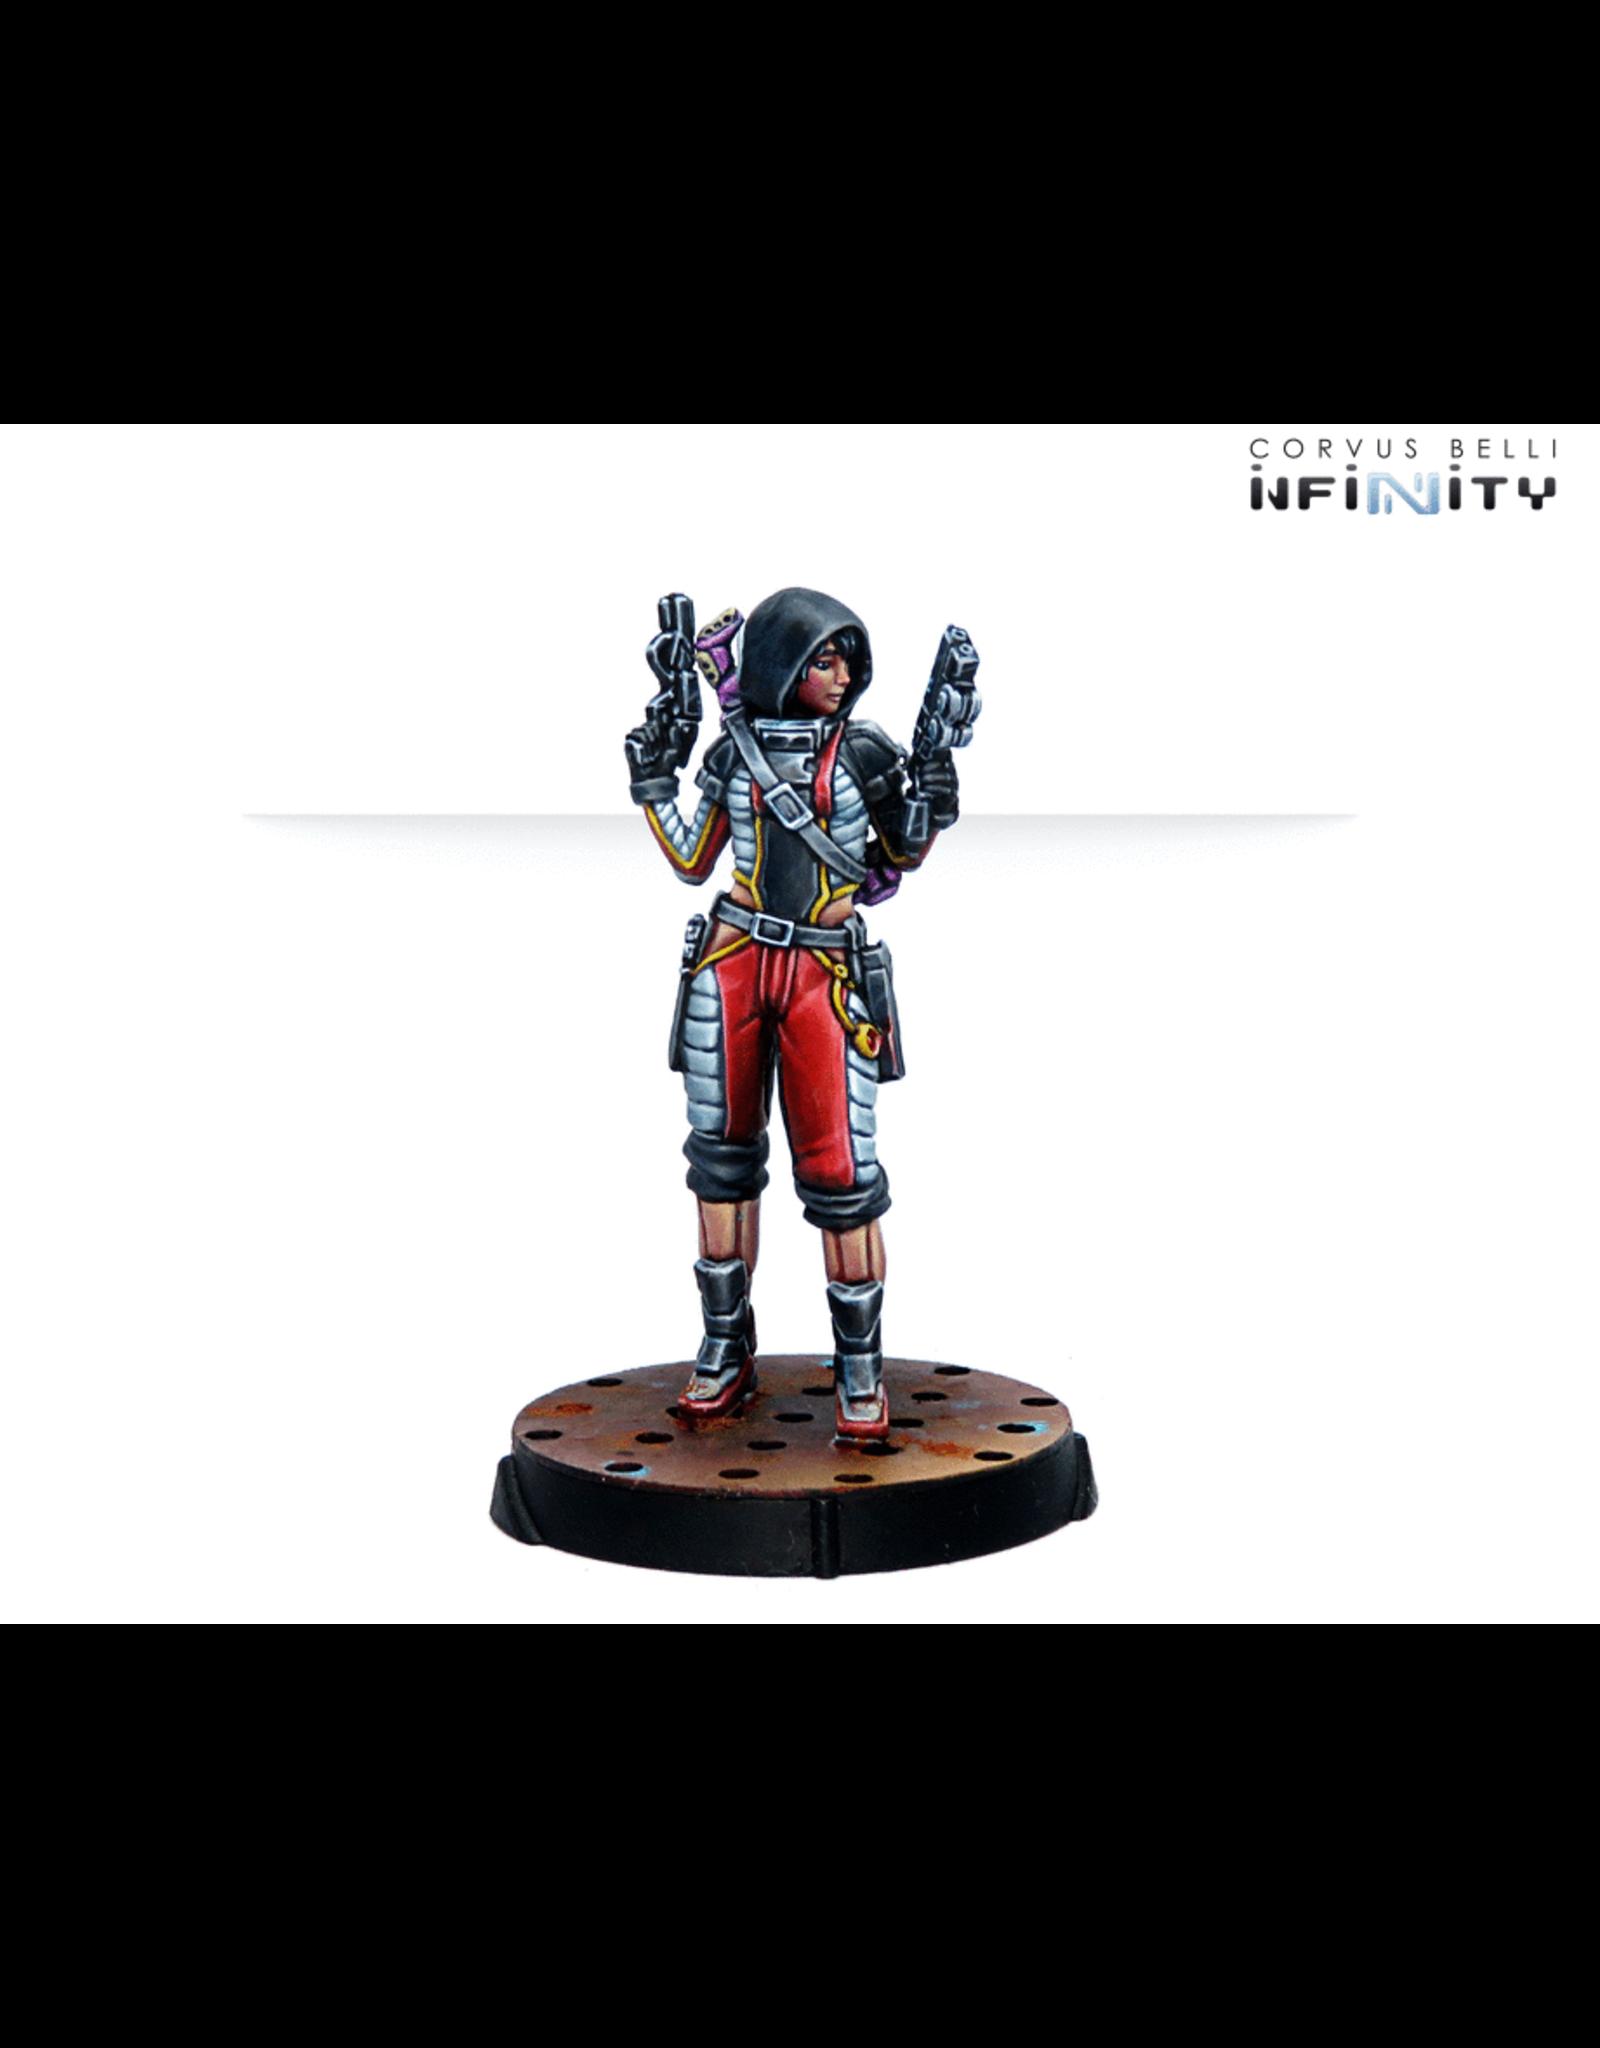 Corvus Belli Infinity: Mary Problems, Tactical UberHacker